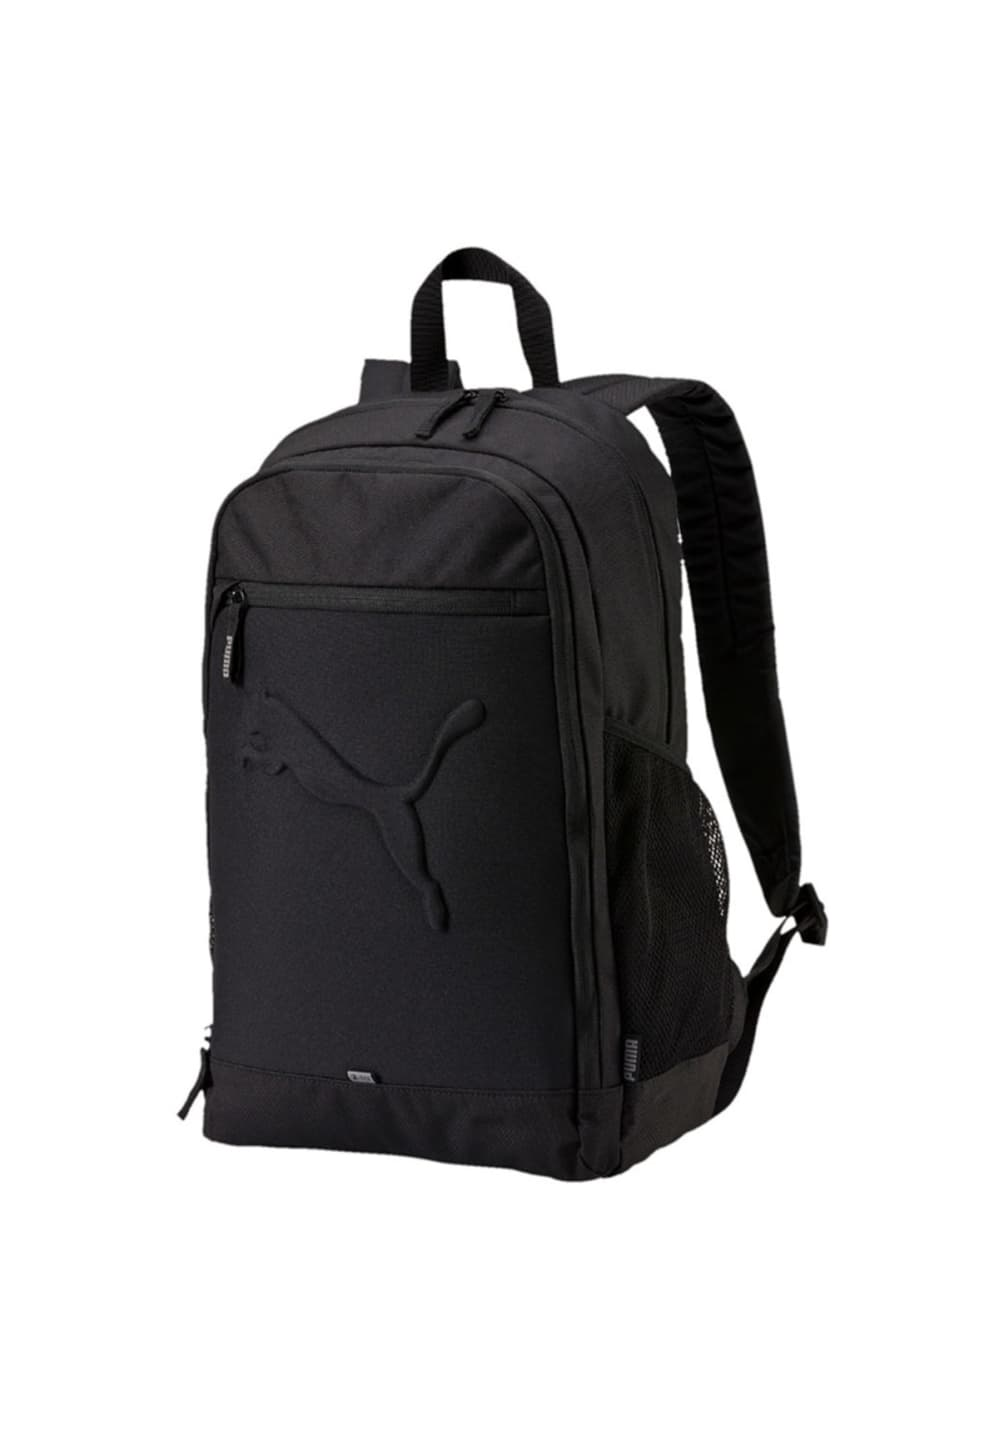 Puma Buzz Backpack Rucksäcke - Schwarz